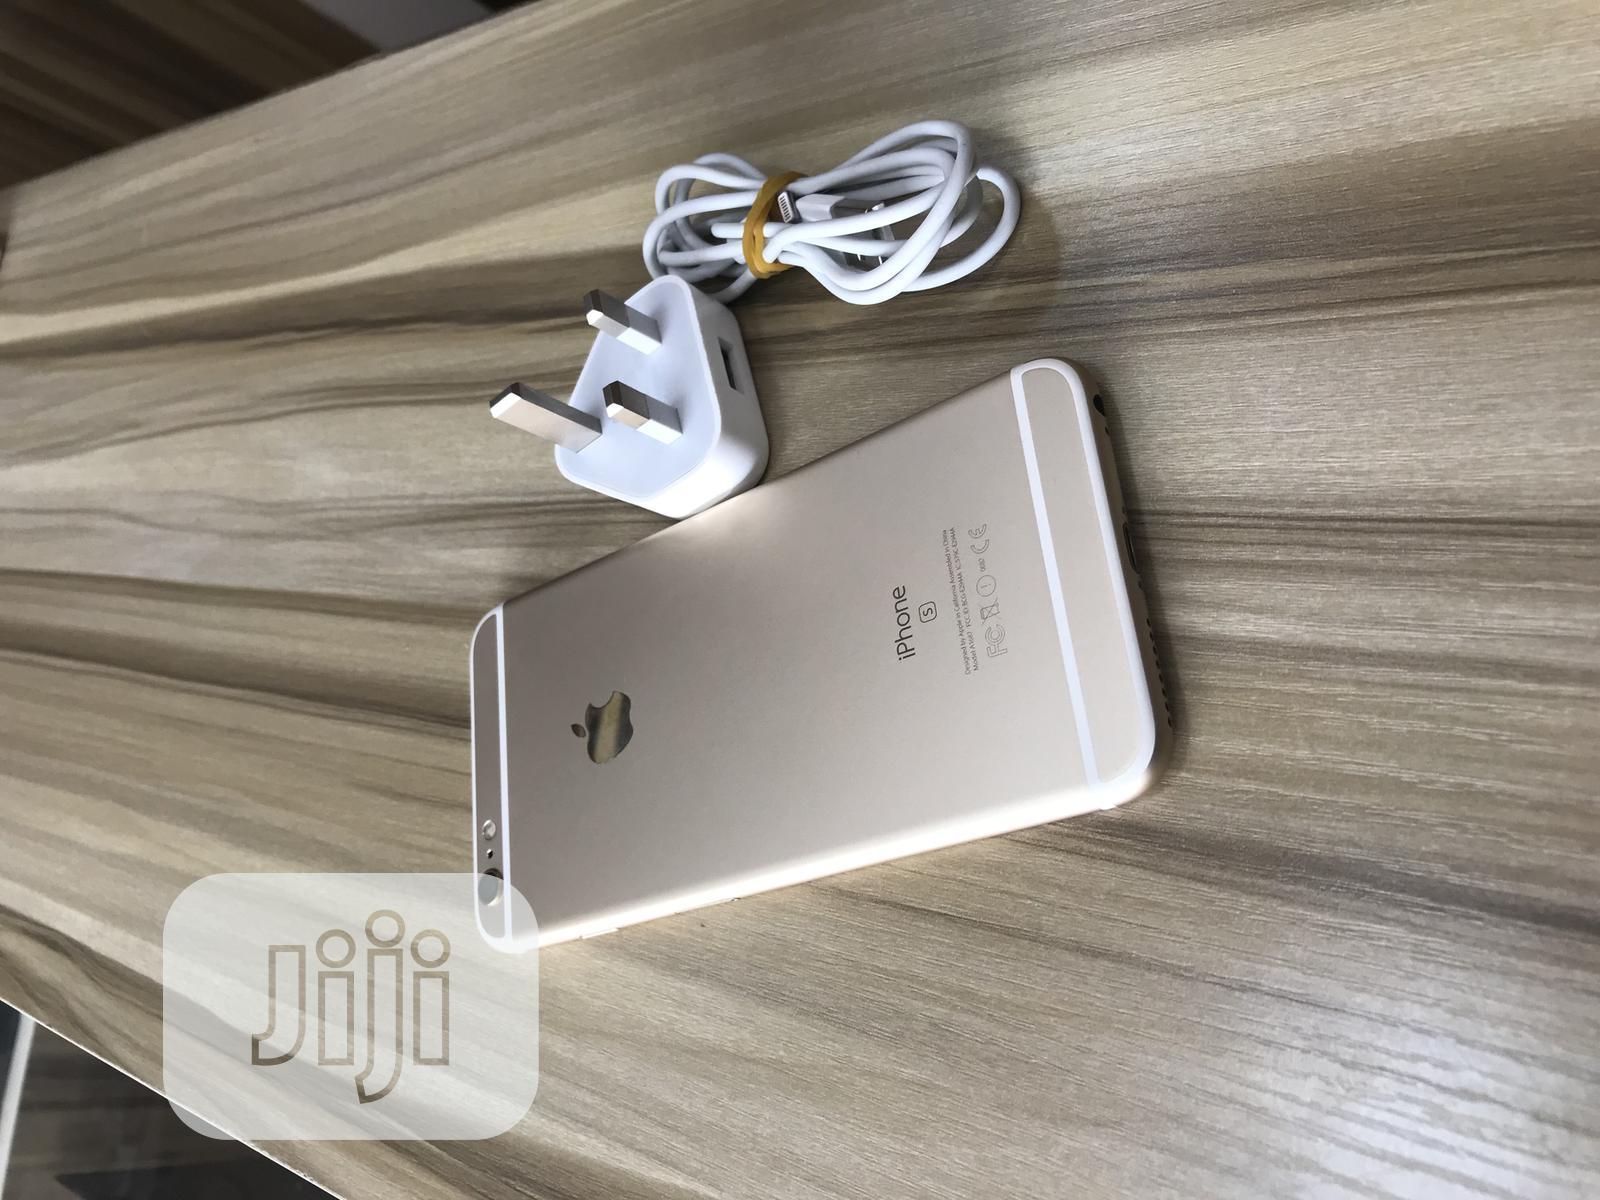 Apple iPhone 6s Plus 64 GB Gold | Mobile Phones for sale in Ikeja, Lagos State, Nigeria